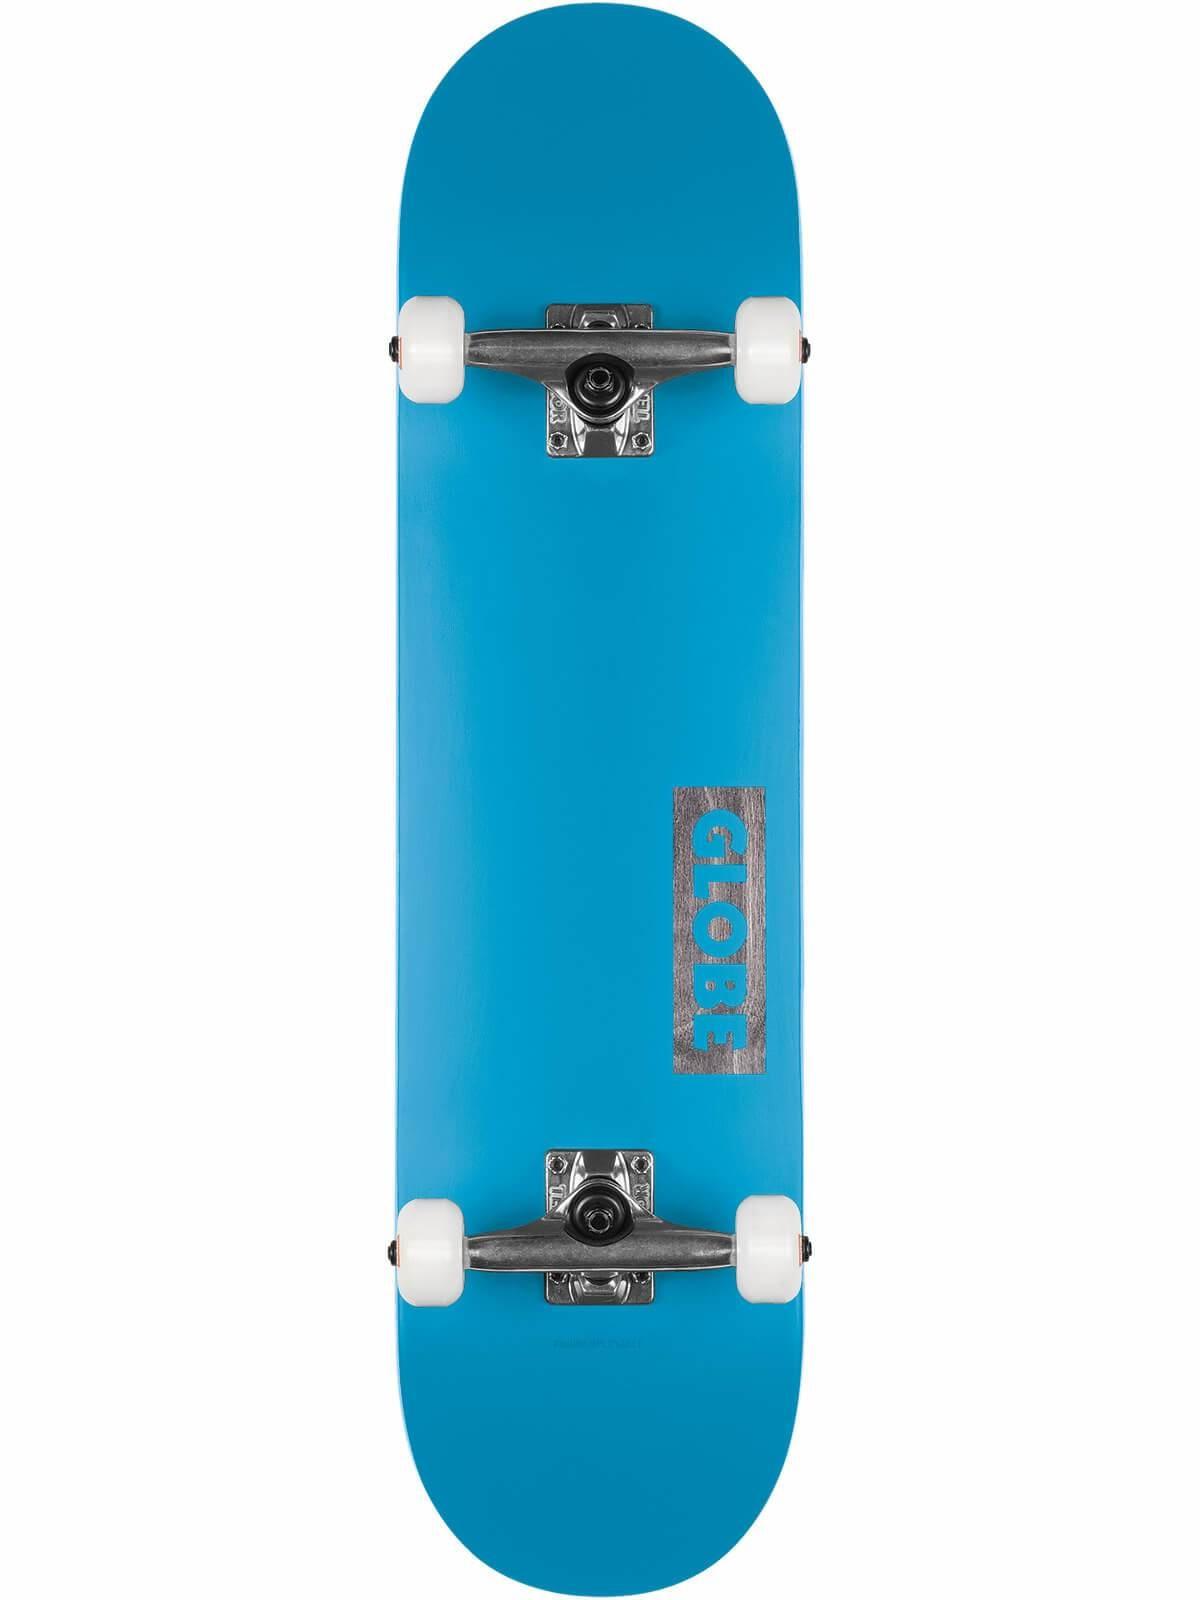 GLOBE Goodstock complete 8.375 - Neon Blue